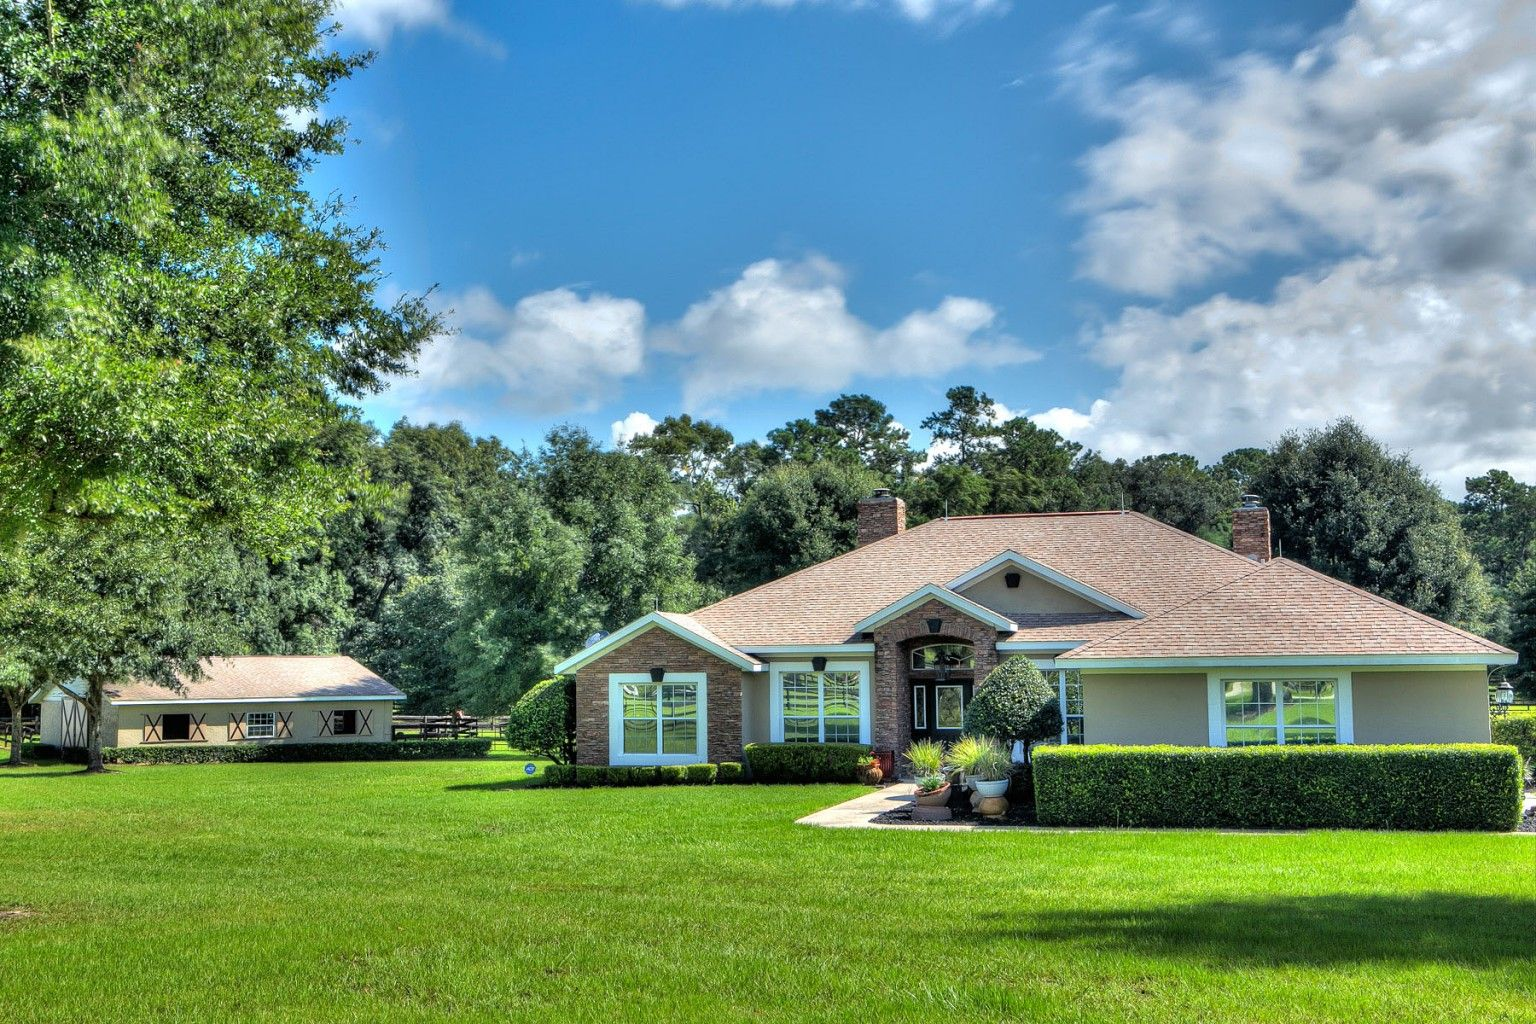 Shady Lane Farm Ocala Farm For Sale Ocala Horse Properties Florida Real Estate Florida Farms Property